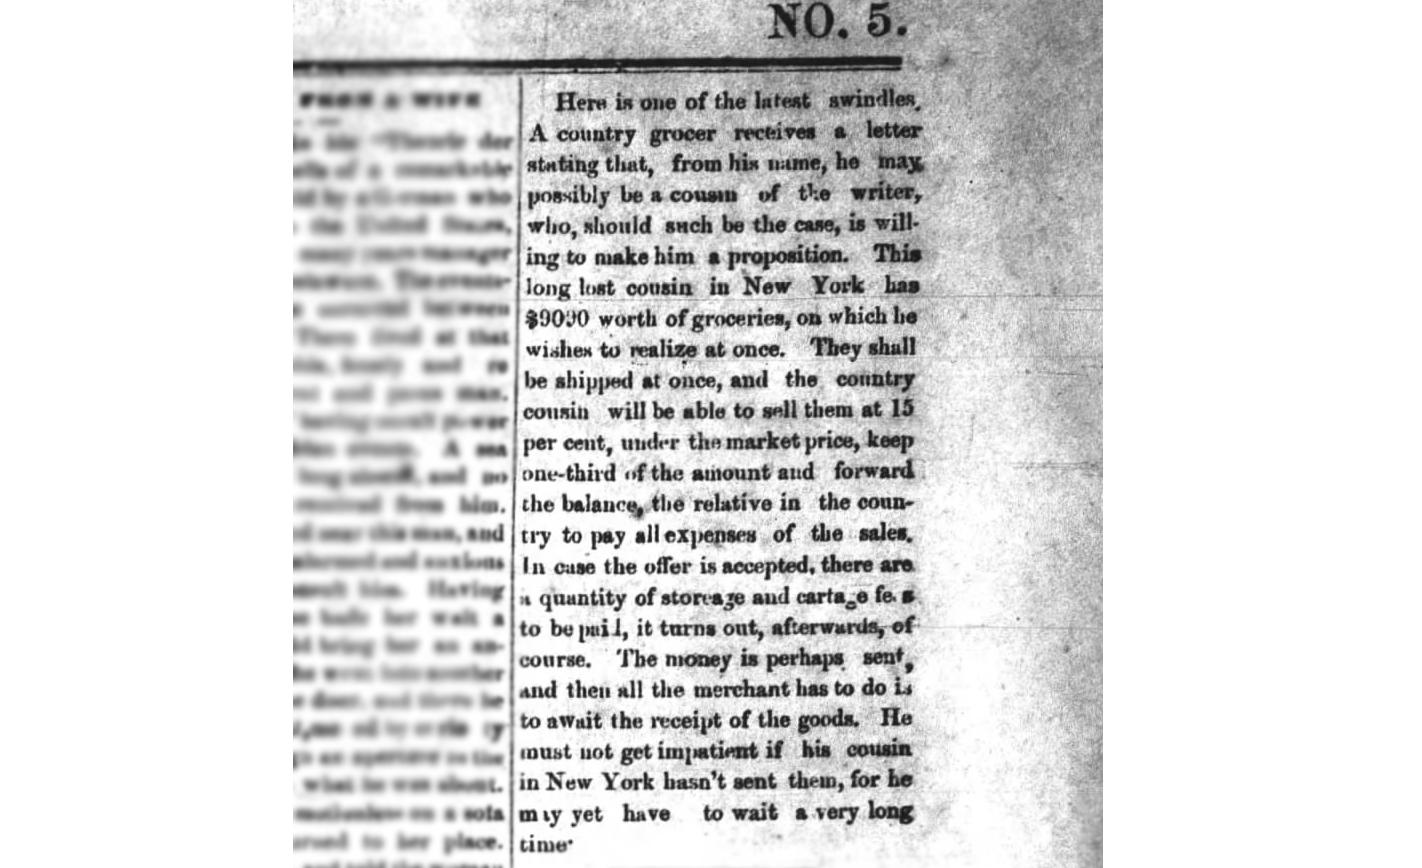 Even the 19th Century Had Needy Nigerian Prince Scams